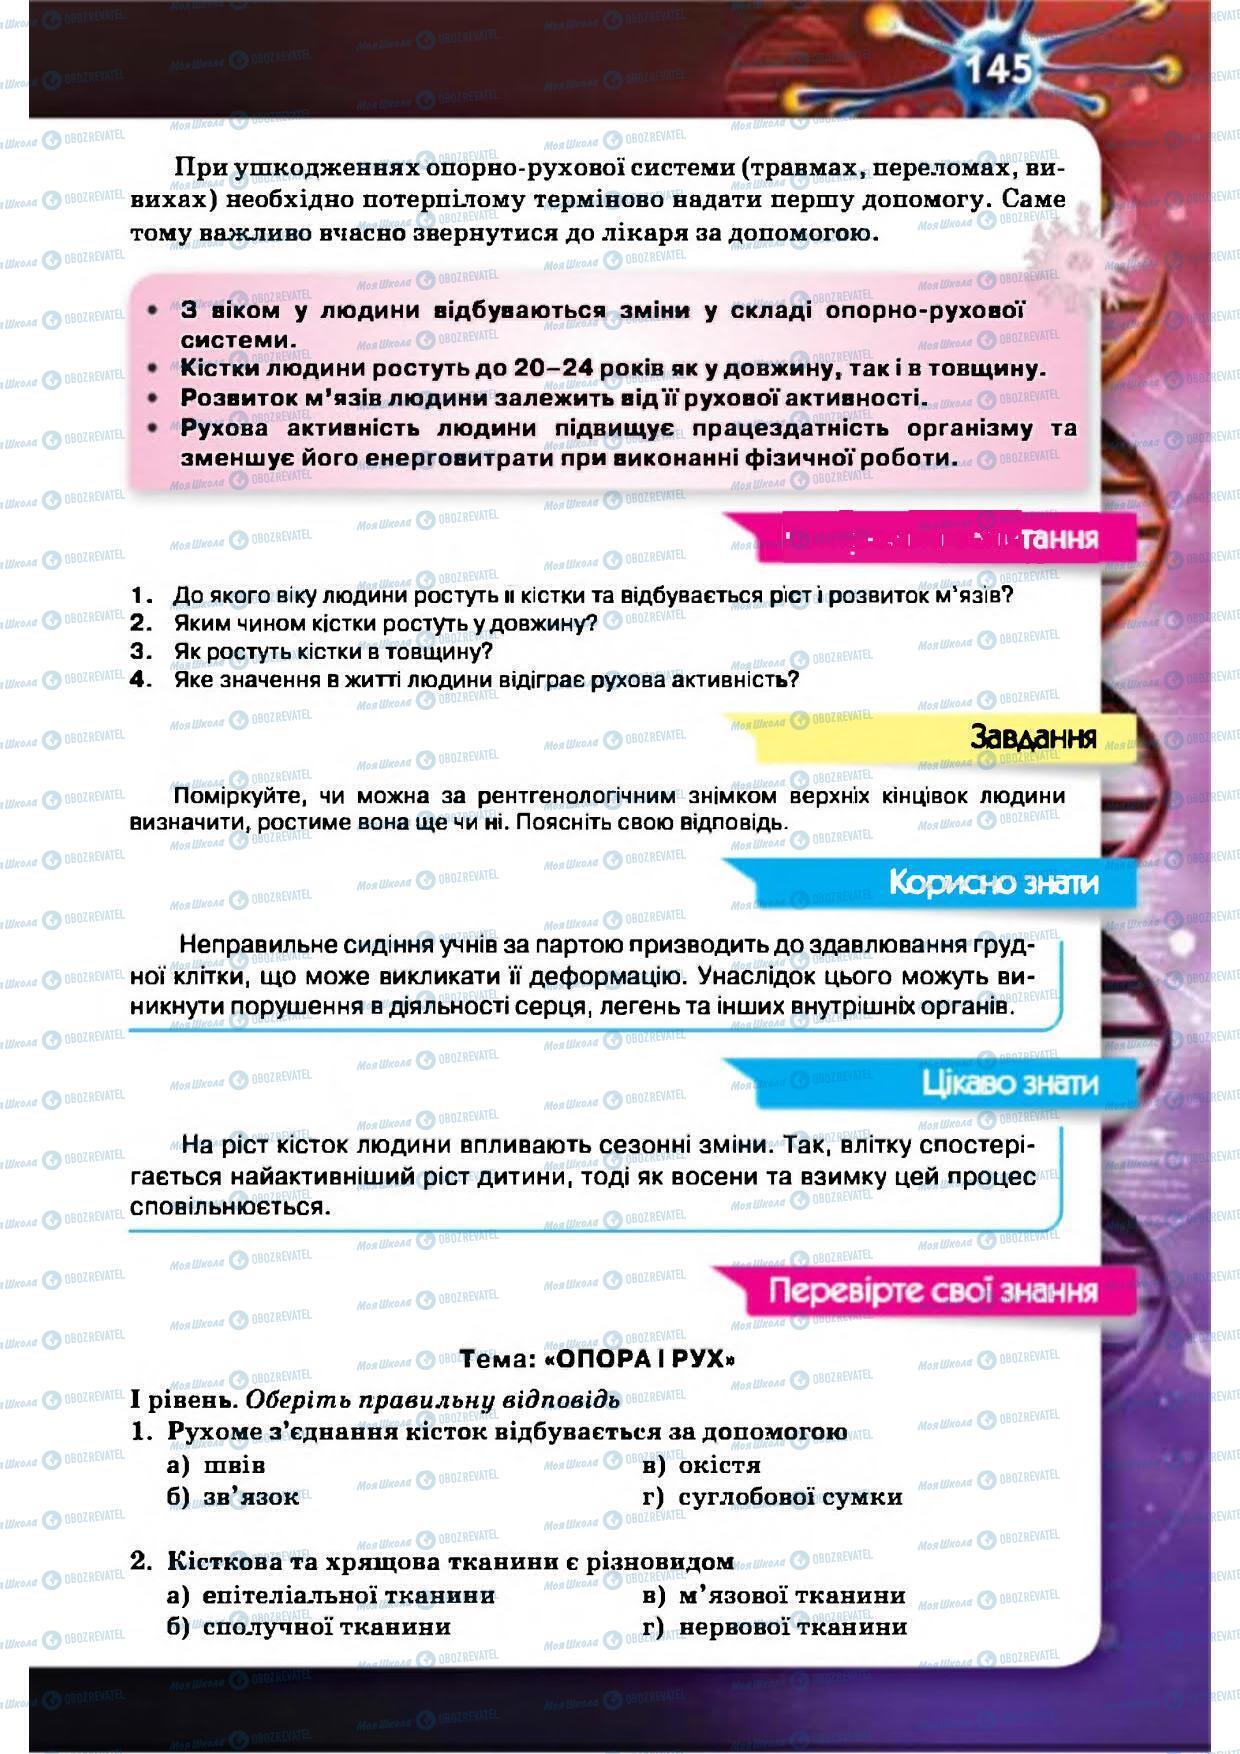 Учебники Биология 8 класс страница 145